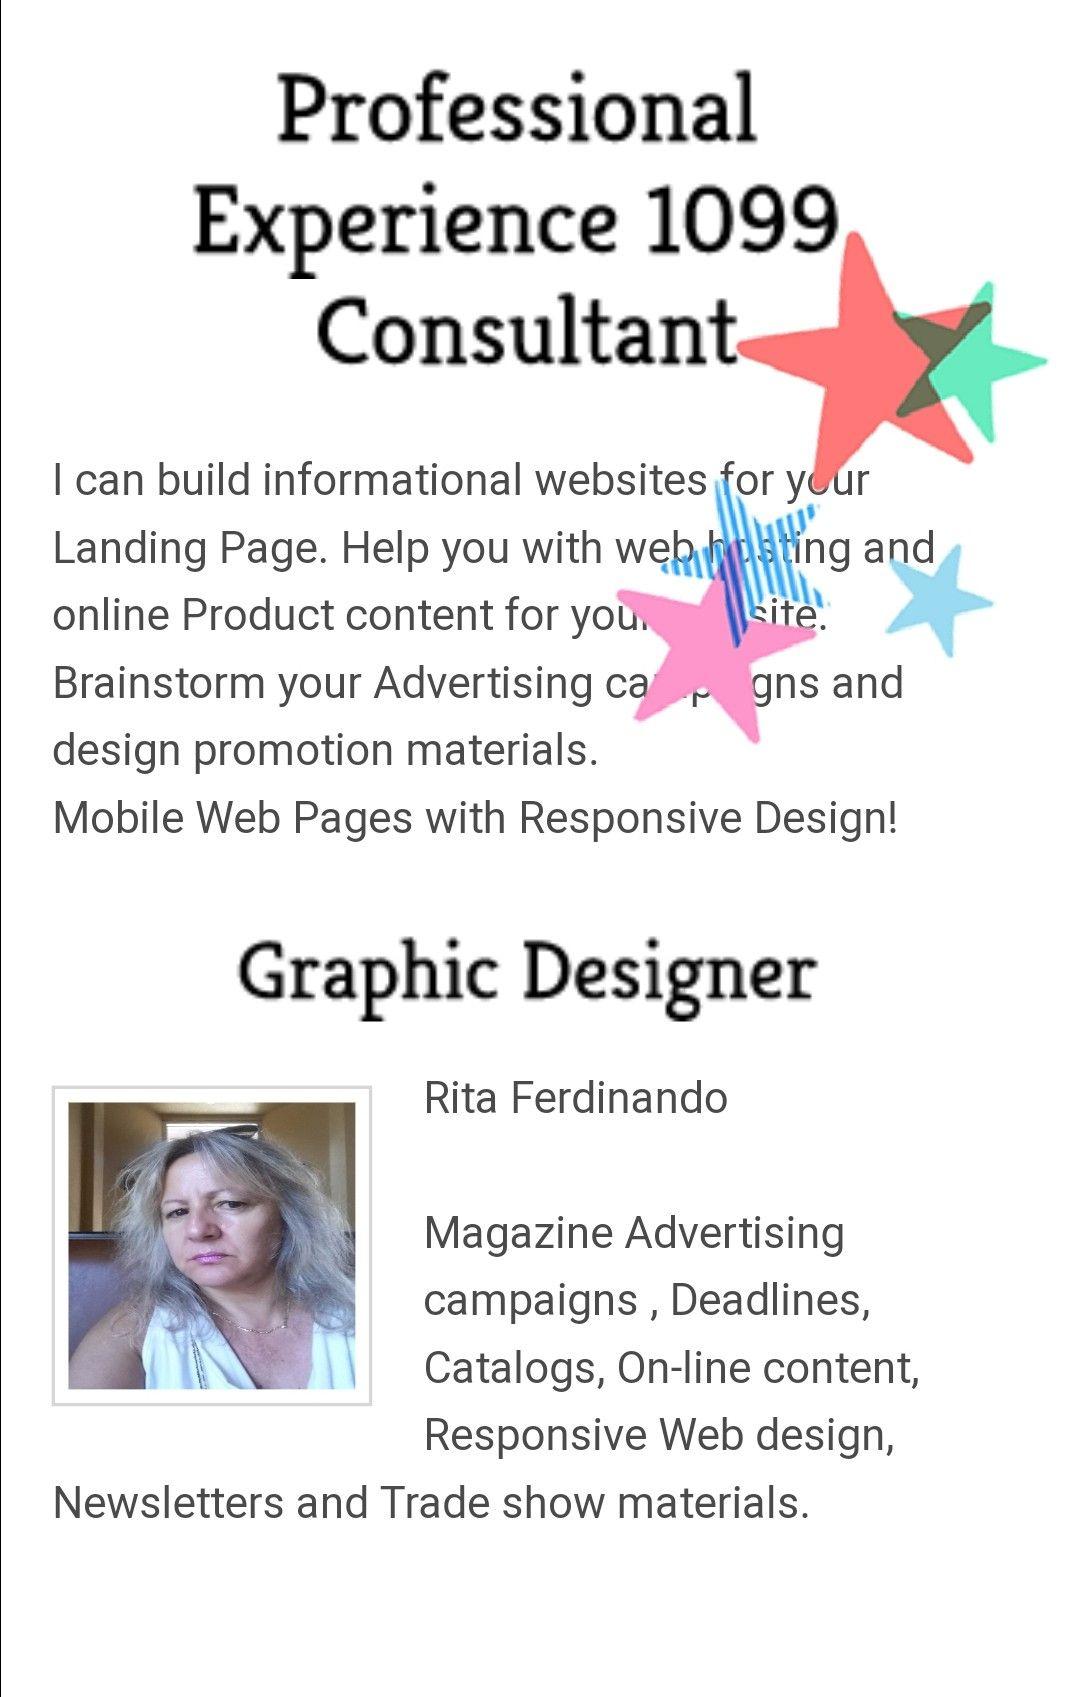 Pin by Rita Ferdinando on job opportunities Informative